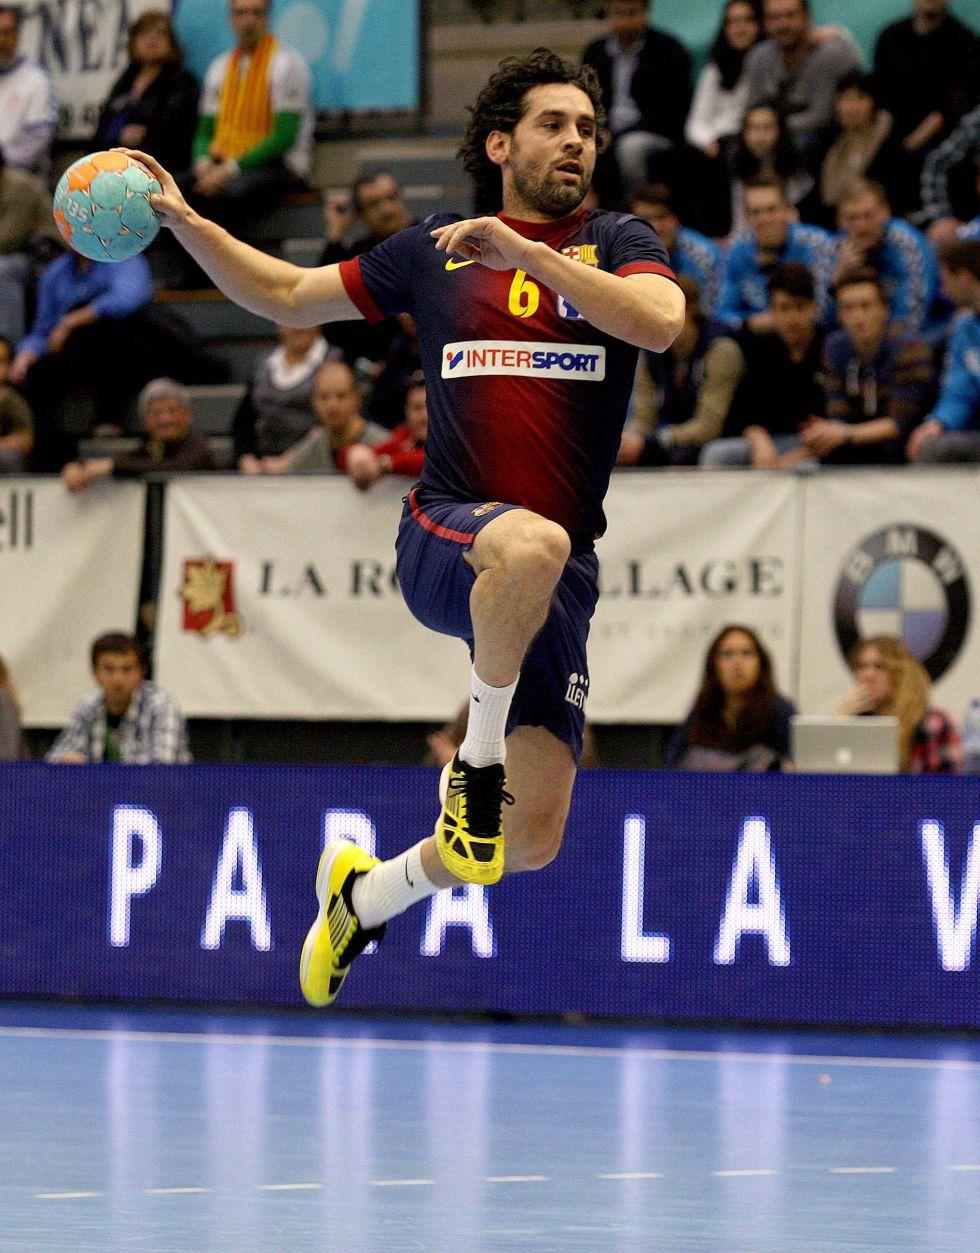 Liga Asobal - Página 3 1369505200_077648_1369505331_noticia_grande